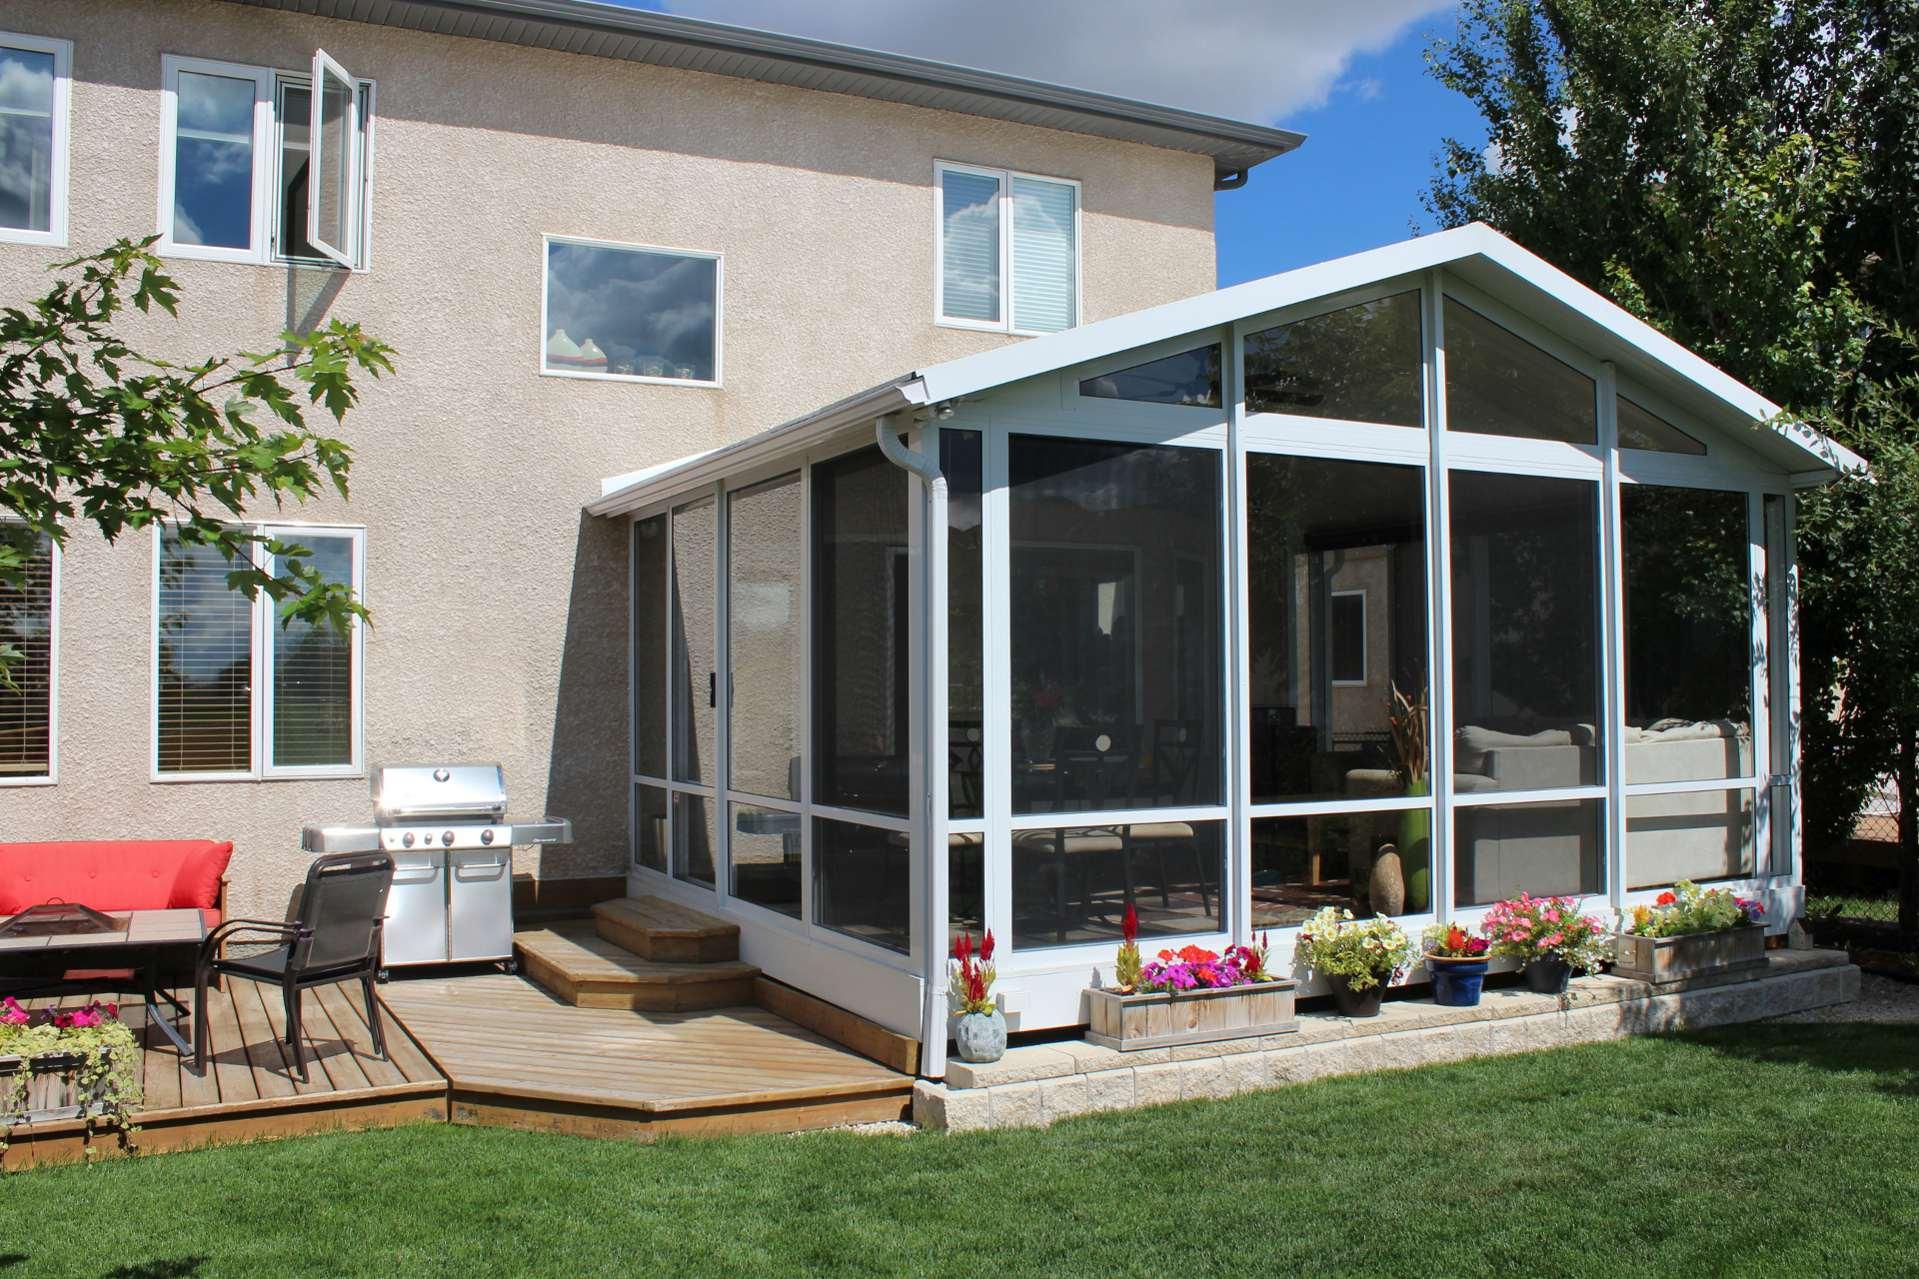 High Quality Maintenance Free Glastar Sunrooms Winnipeg By Sunshade